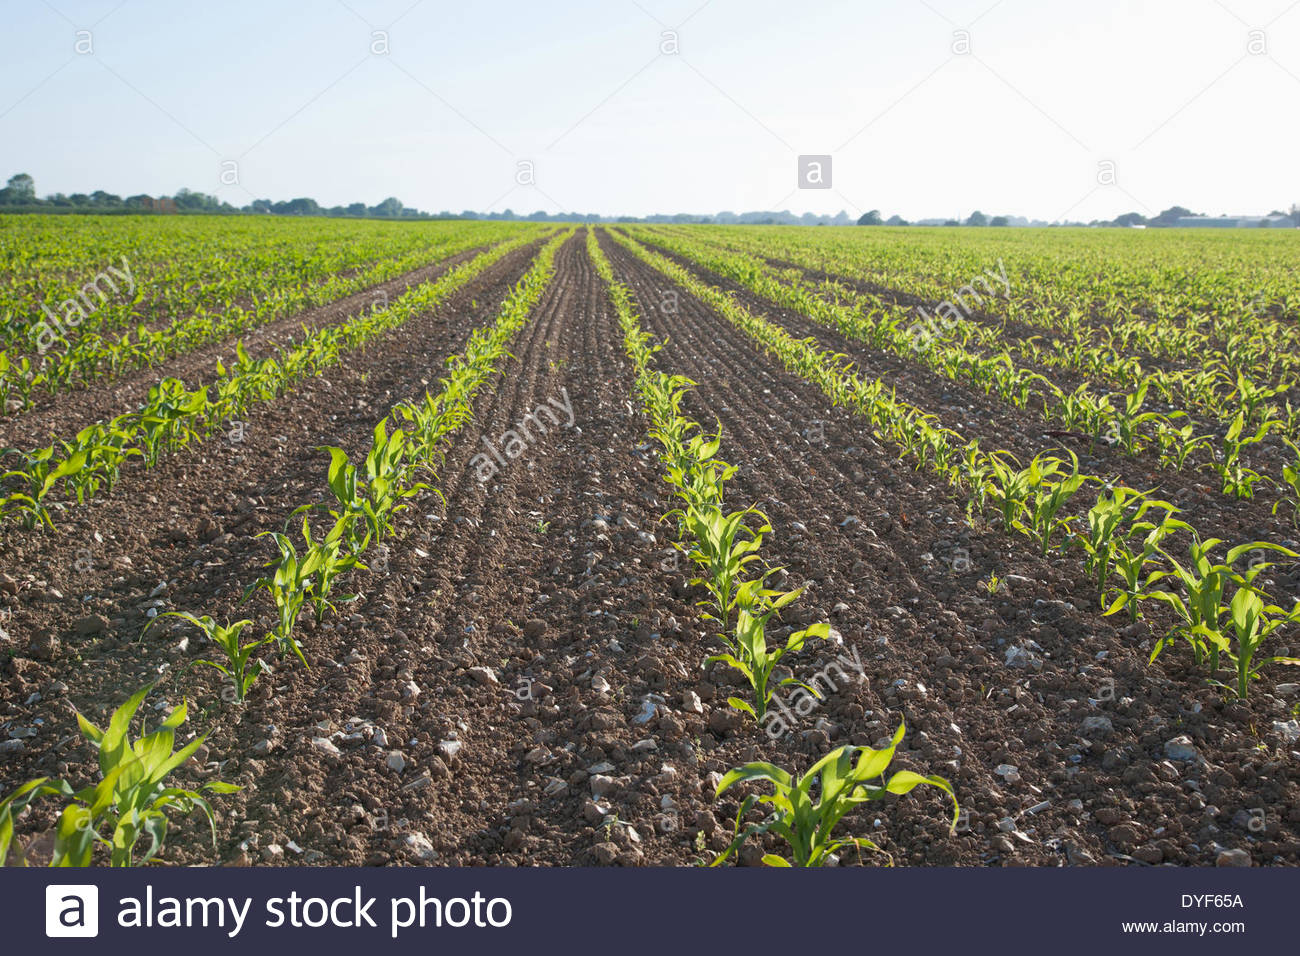 Plants growing in field - Stock Image